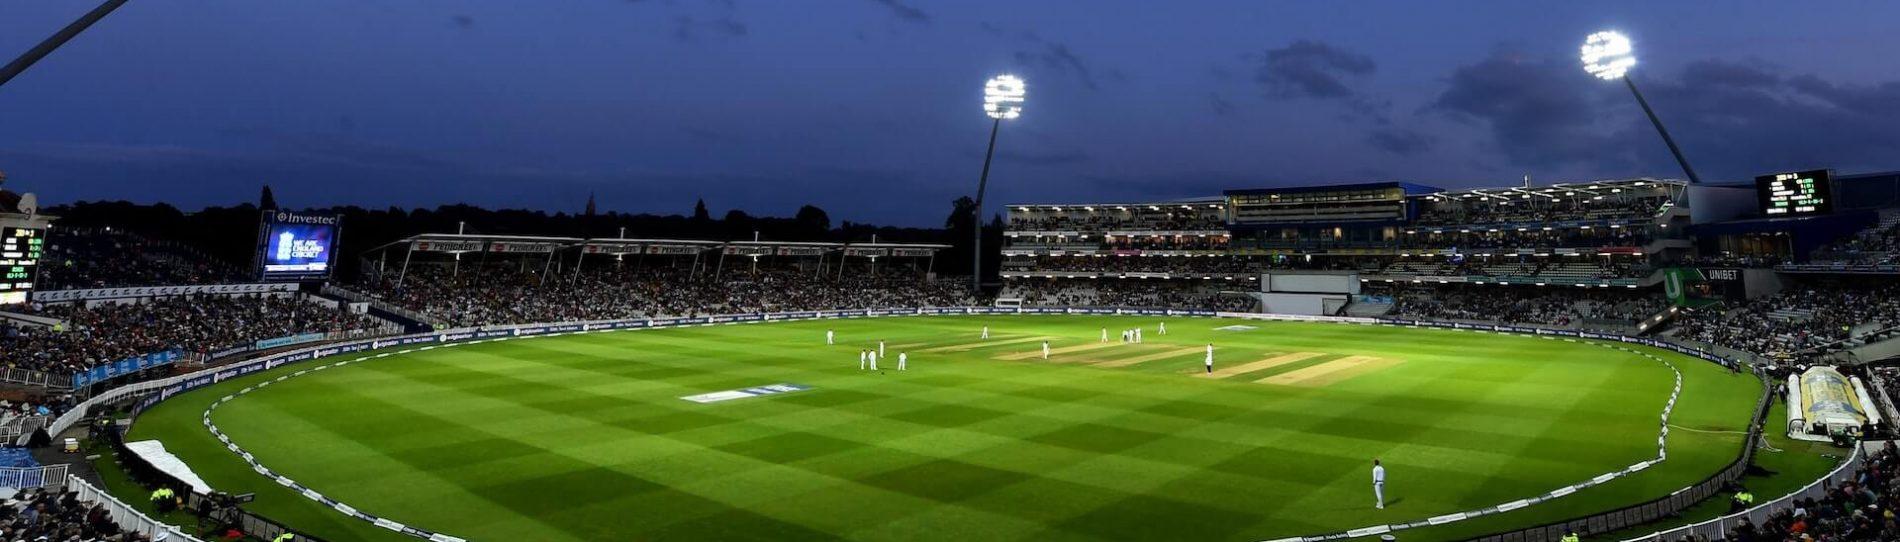 cricket-preseason-training